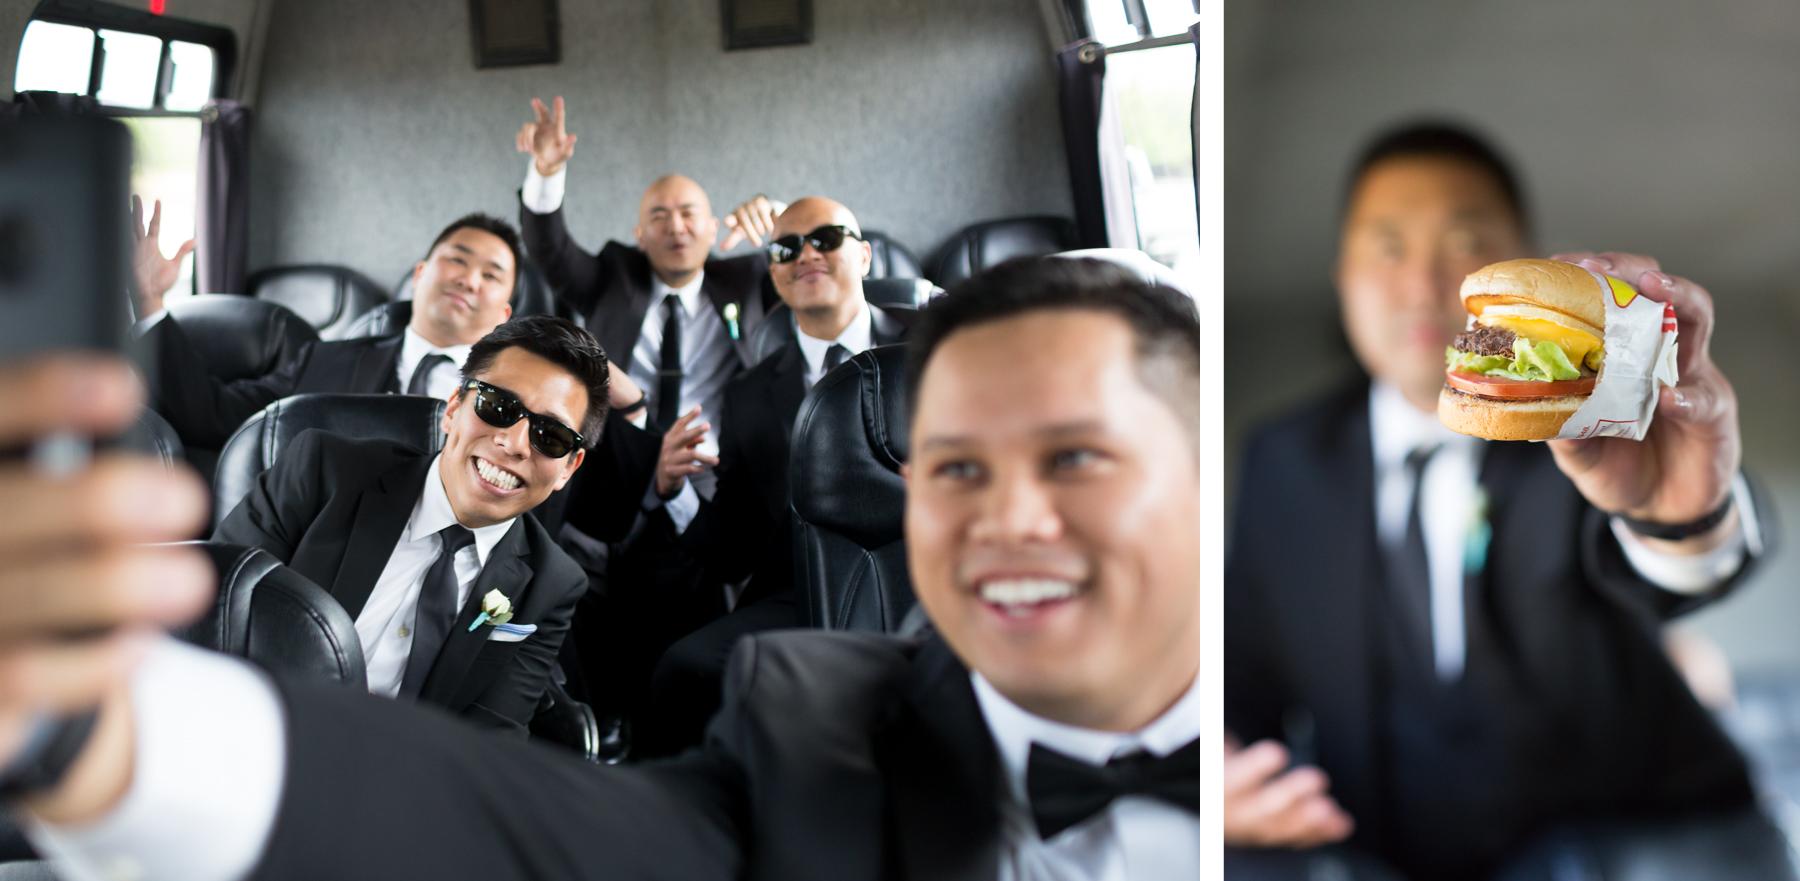 candid-wedding-photography-austin.jpg